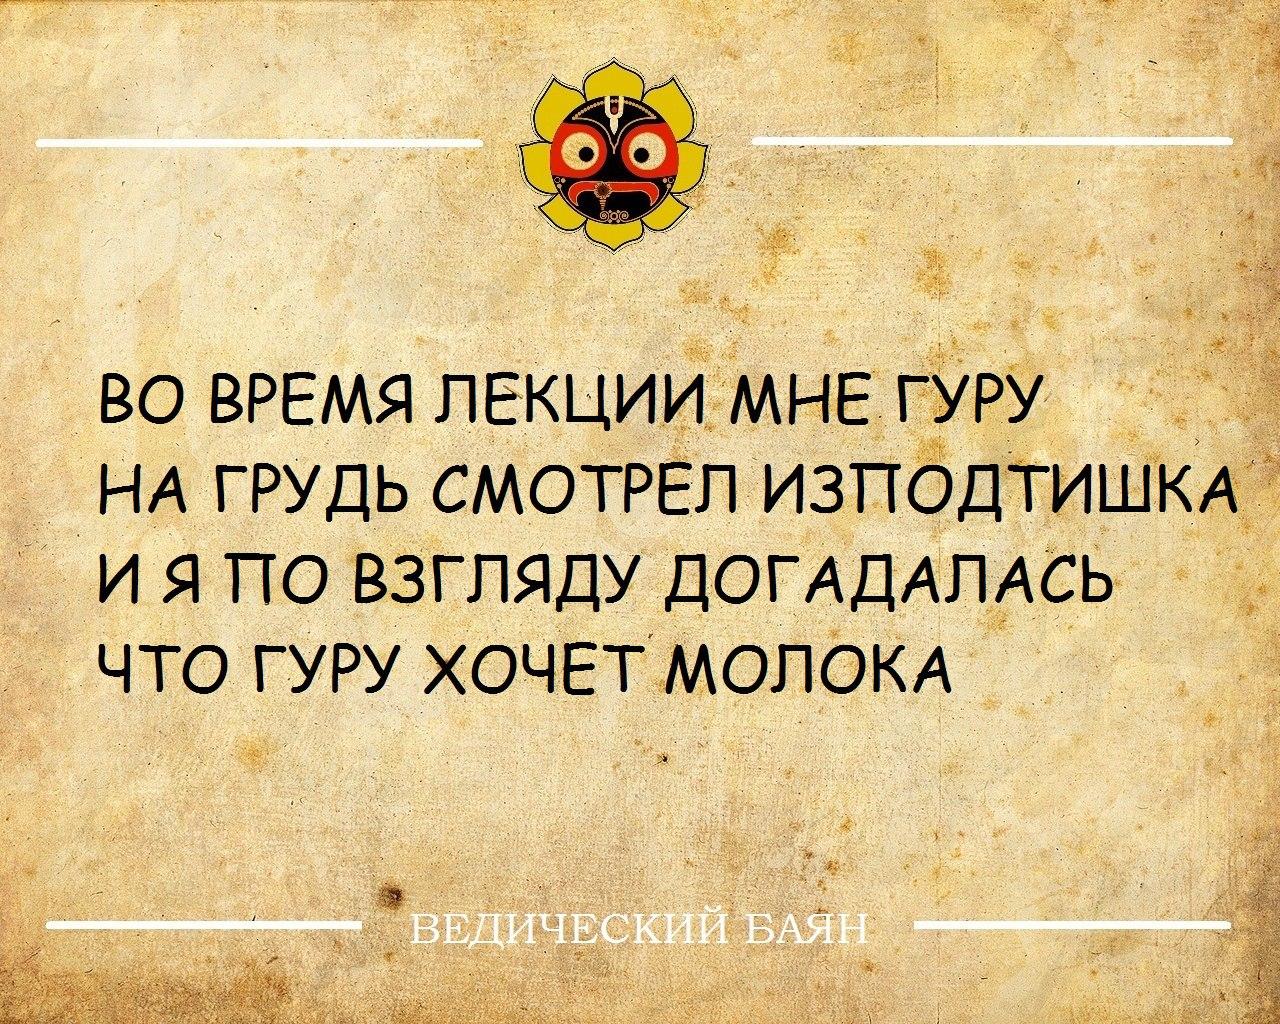 https://pp.userapi.com/c834301/v834301963/3fbef/2JPivbtegkY.jpg